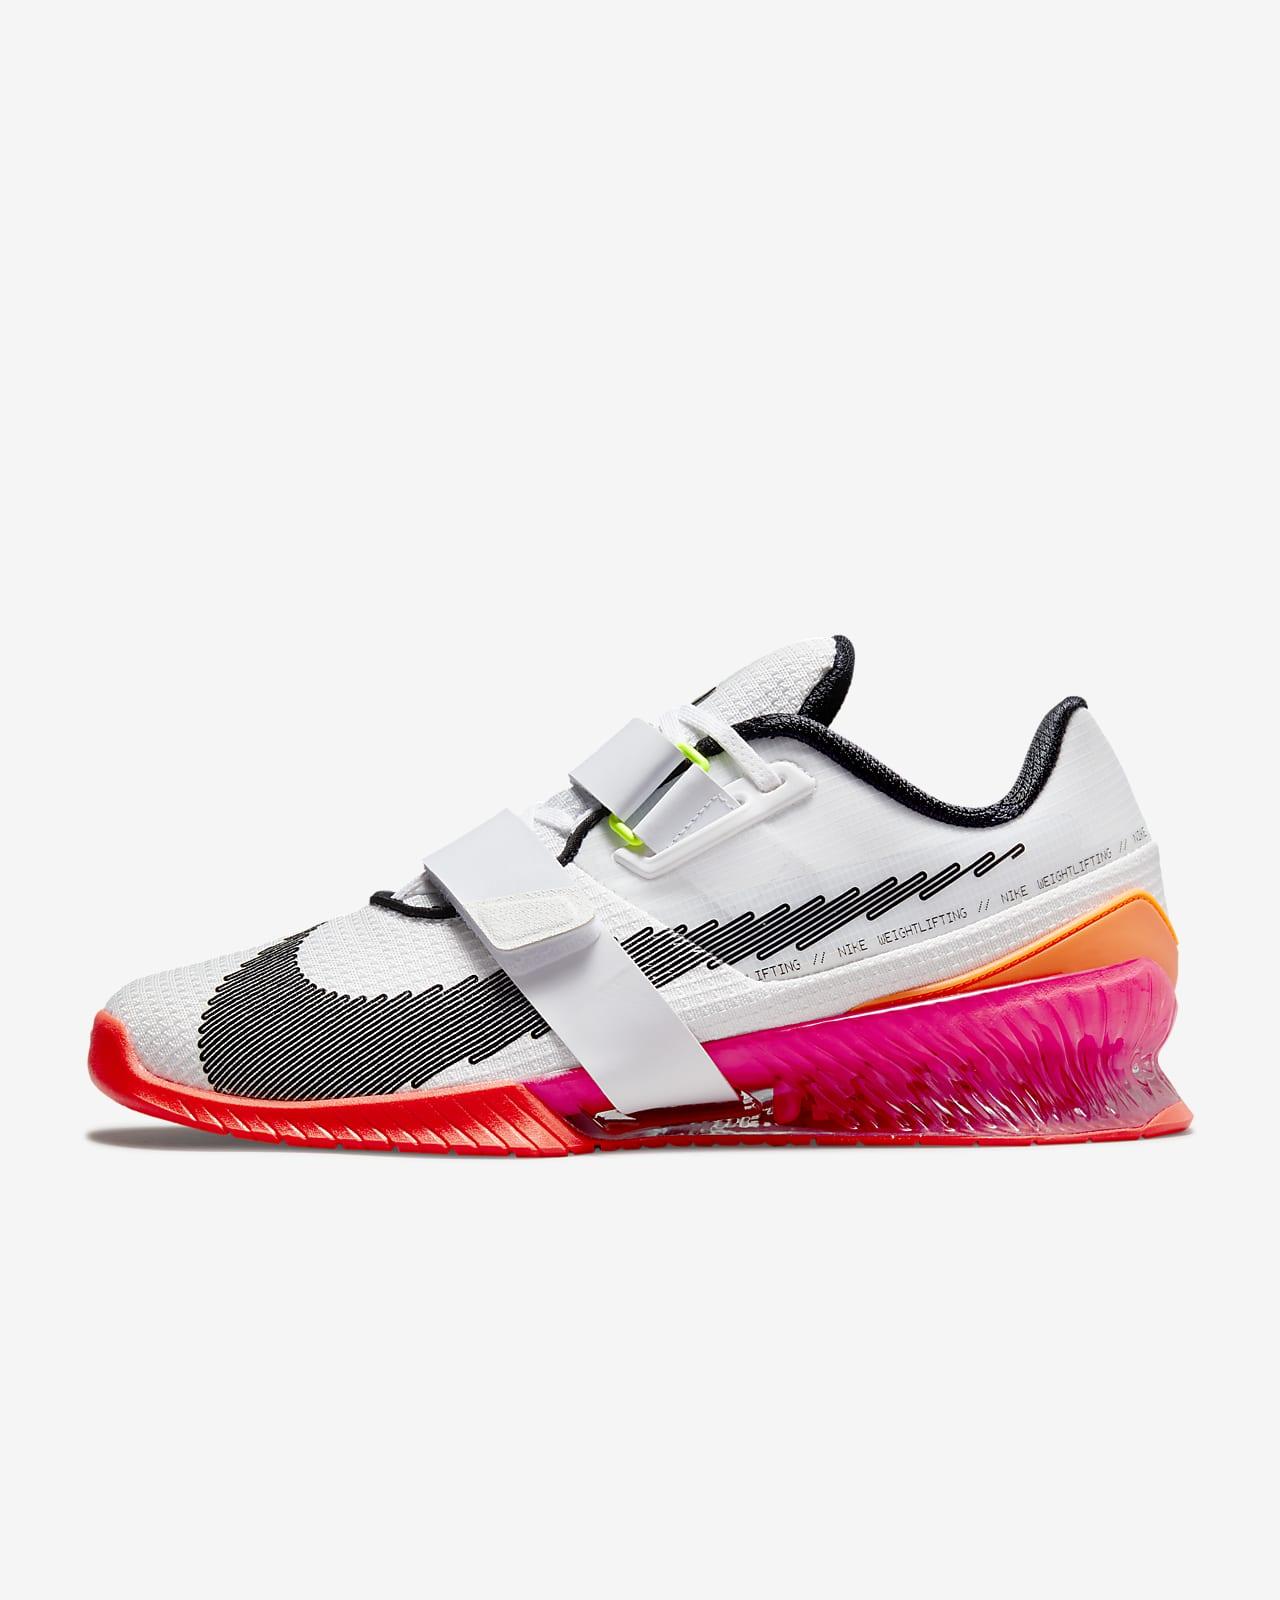 Calzado de levantamiento de pesas Nike Romaleos 4 SE